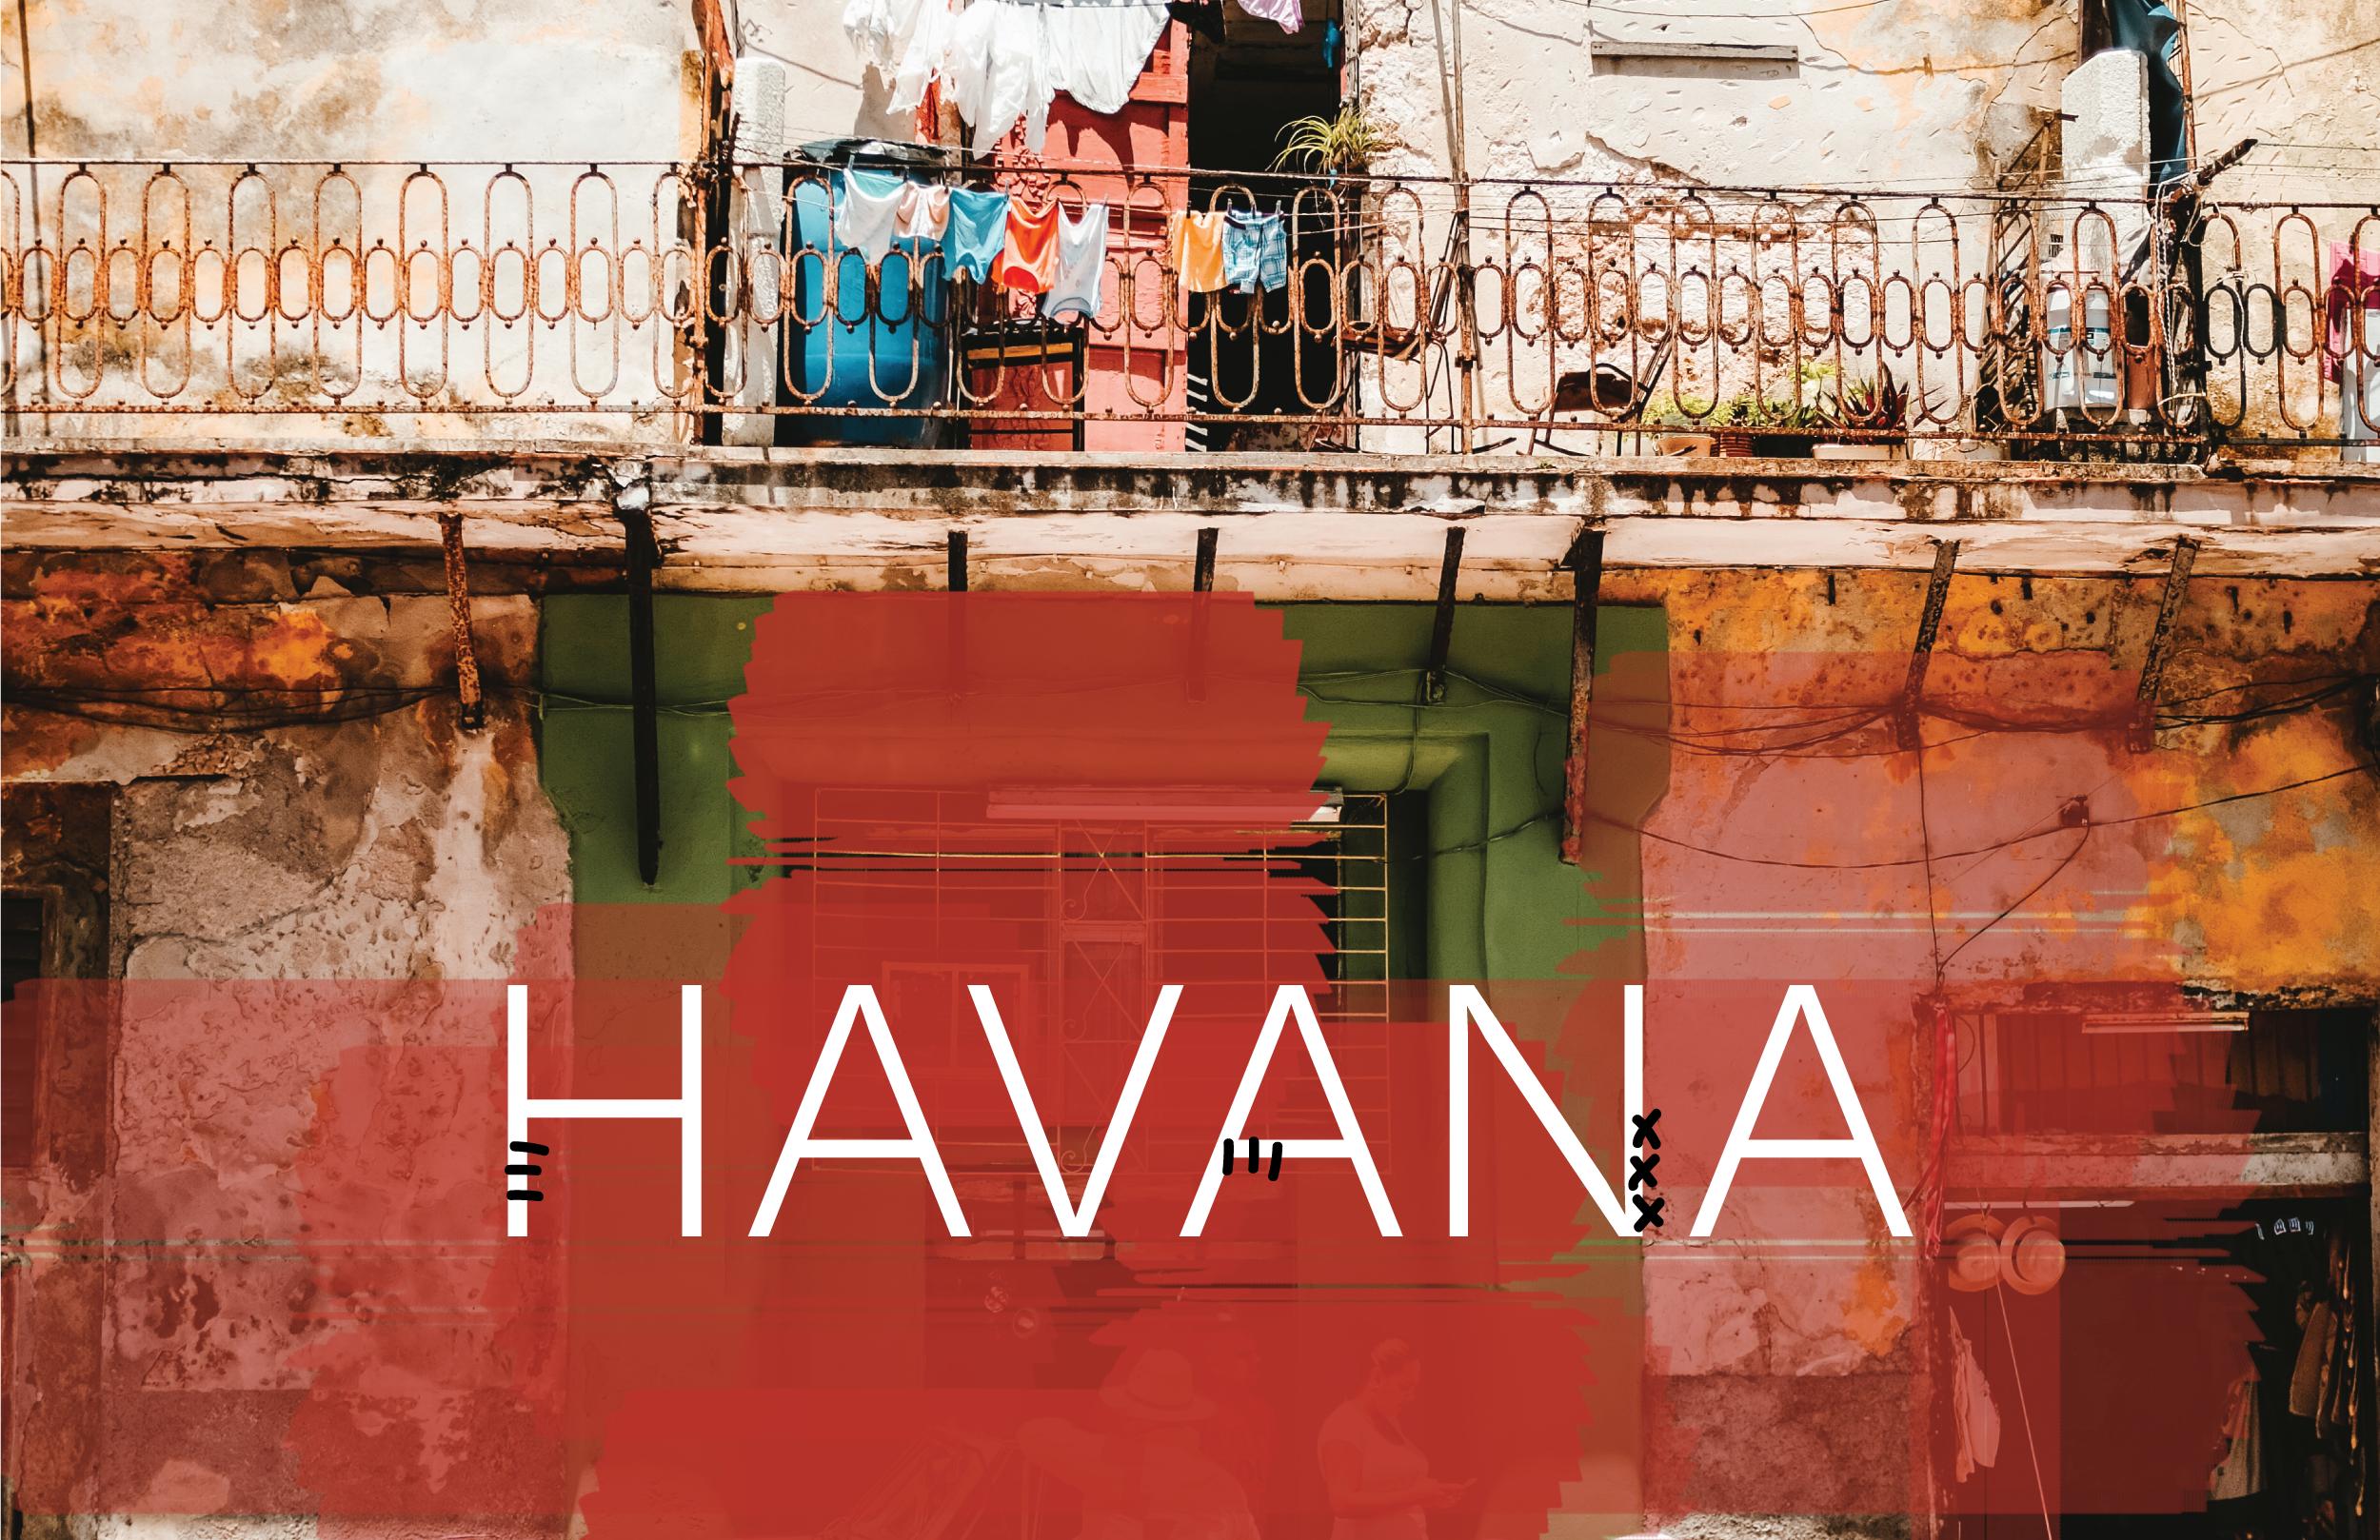 TITLES-OF-CITIES-CUBA.png